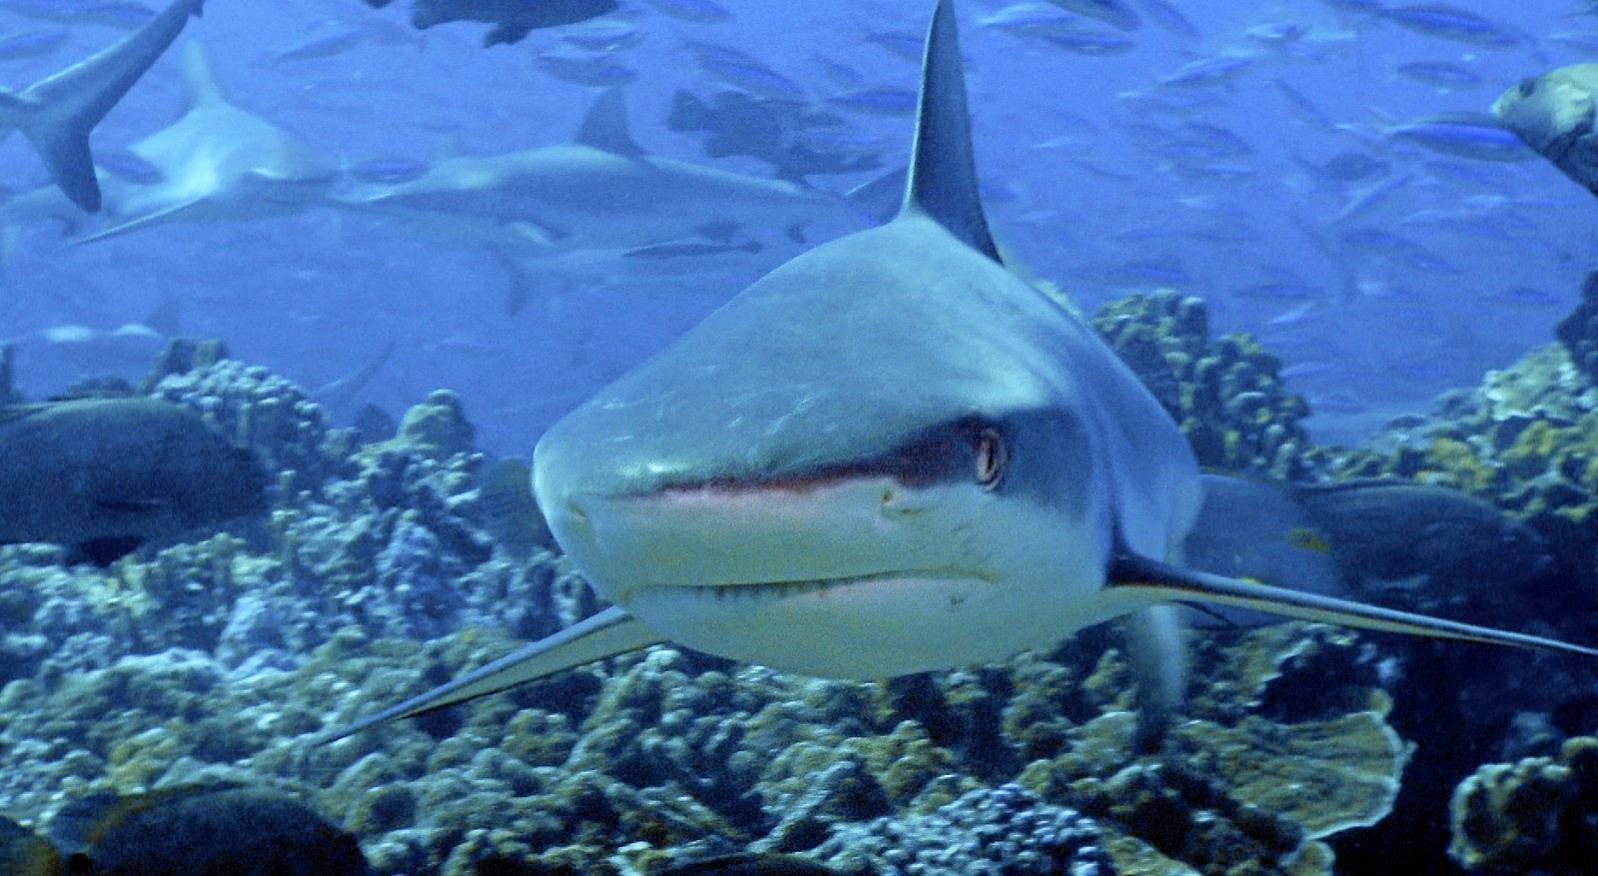 SHARK FEAST: Fisherman believed the shark that bit him was a reef shark at Swain Reefs.